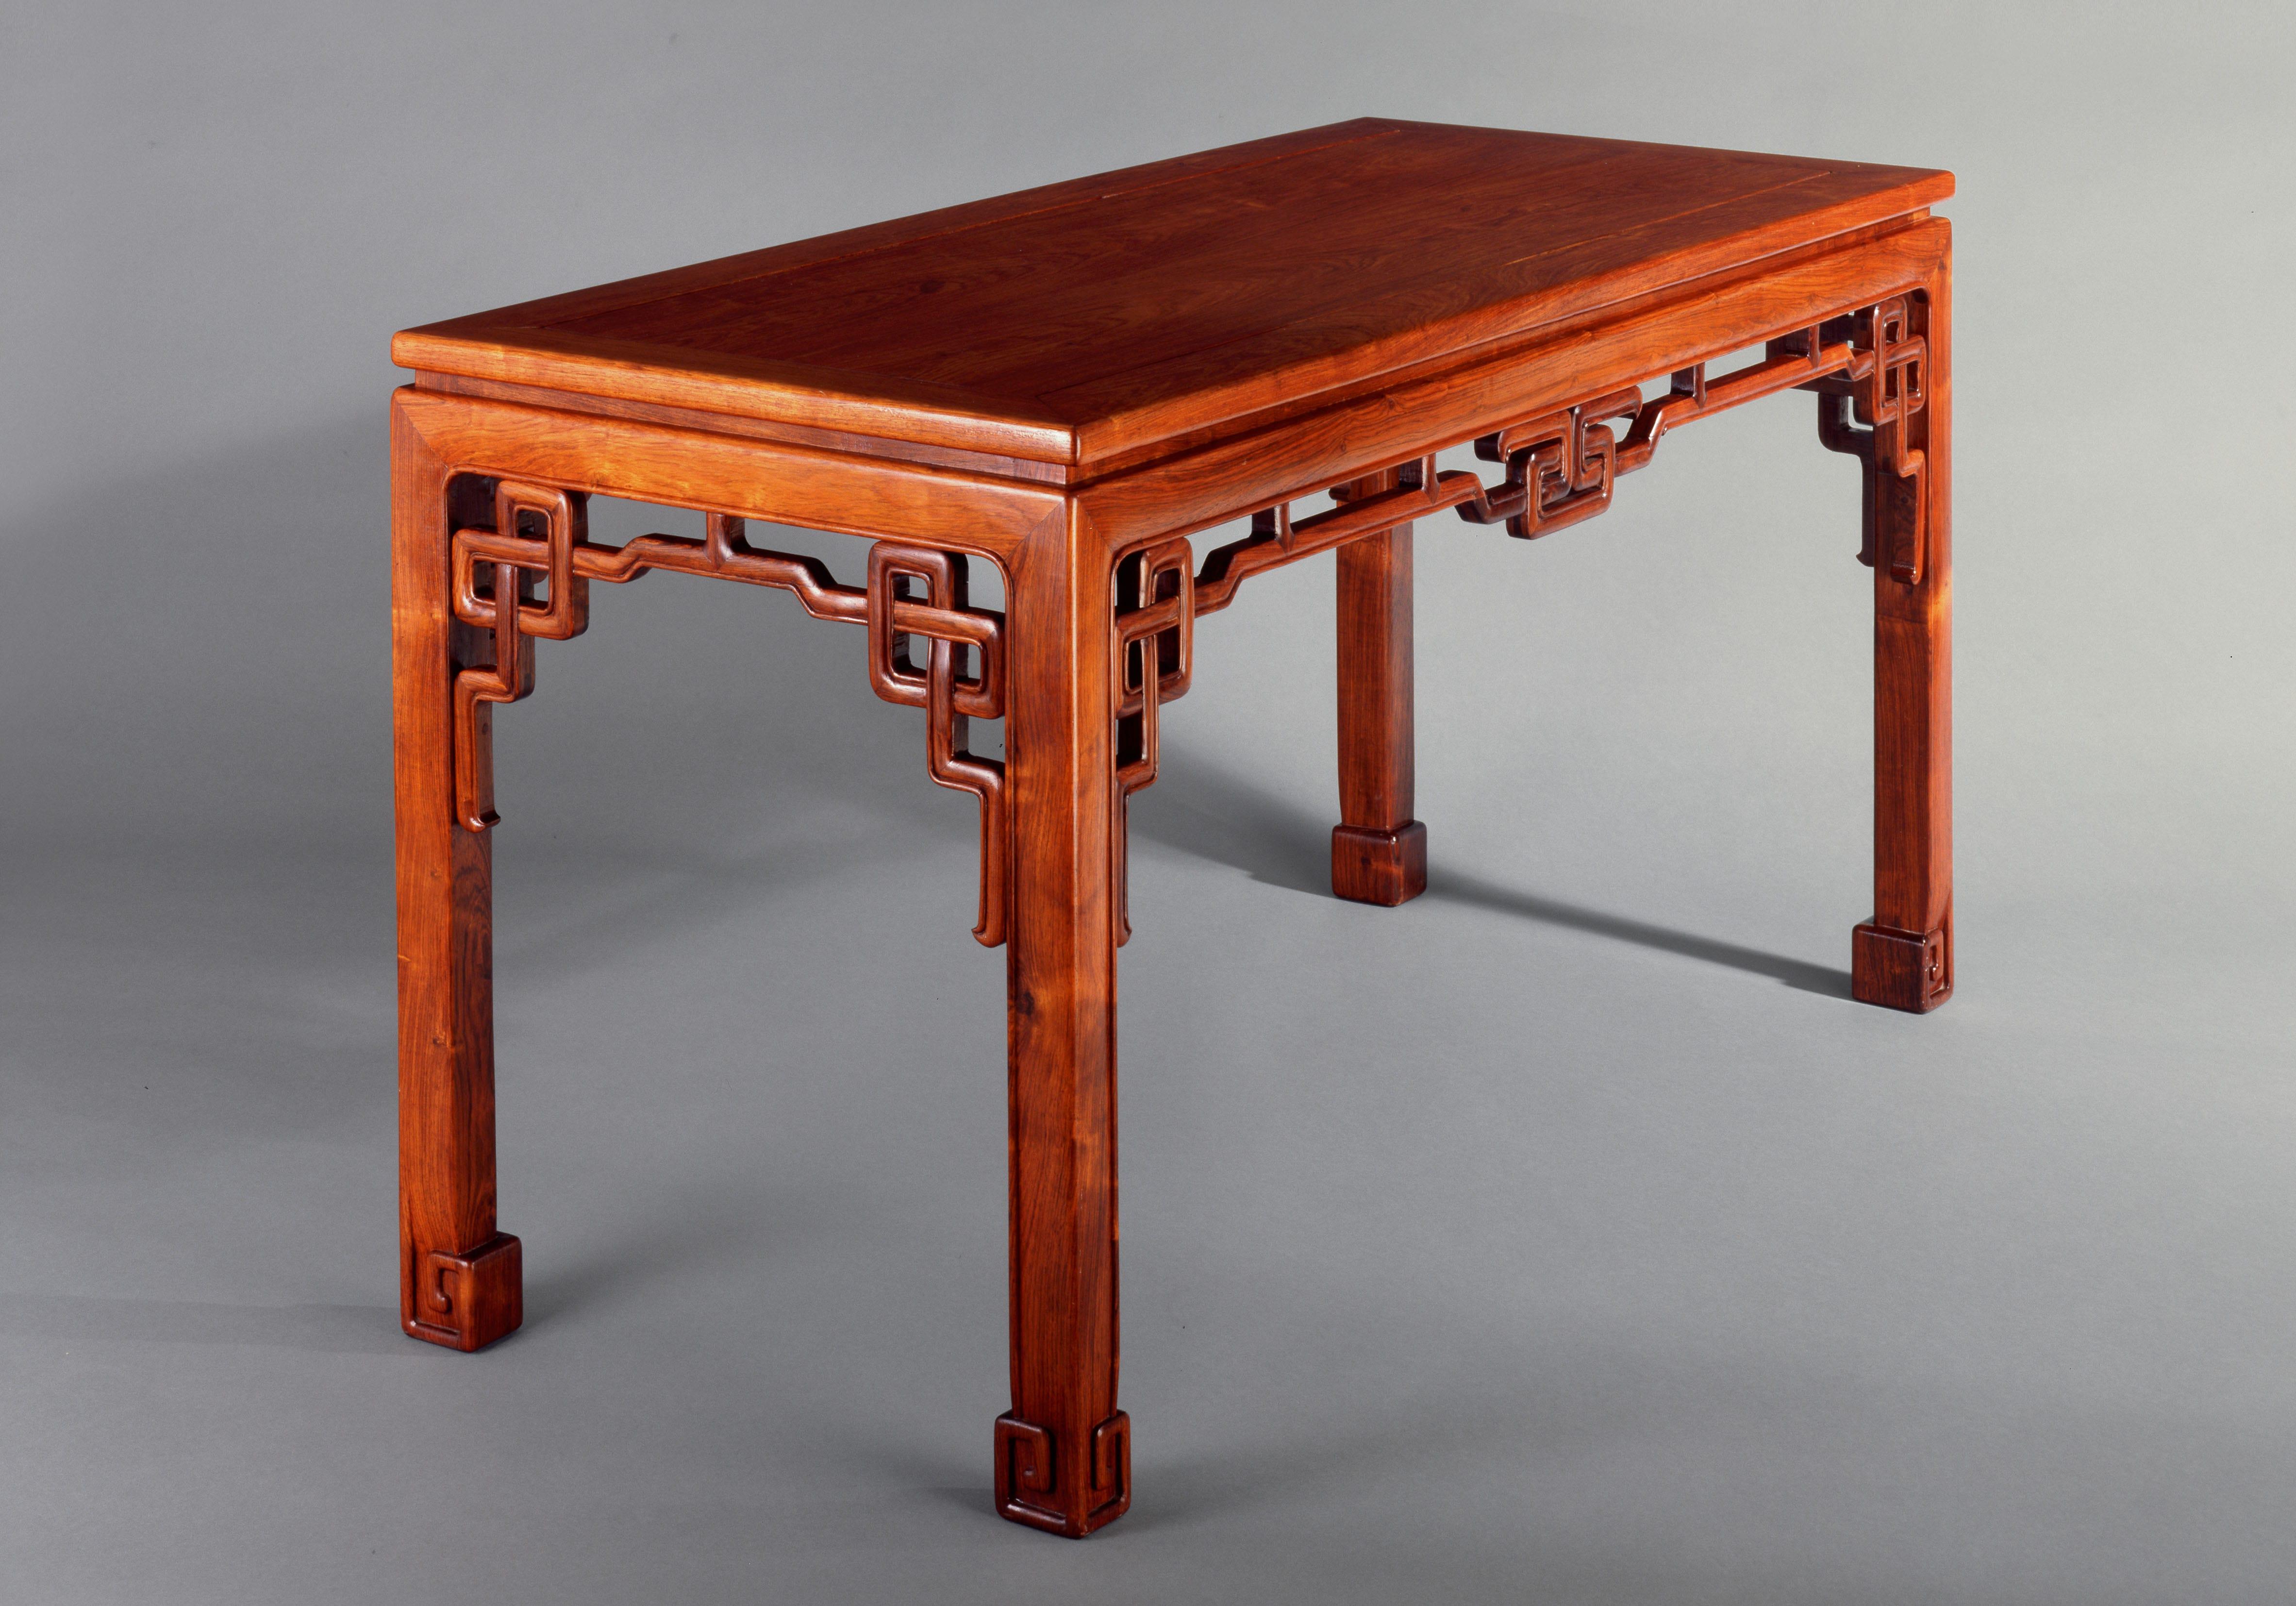 Cold River Furniture